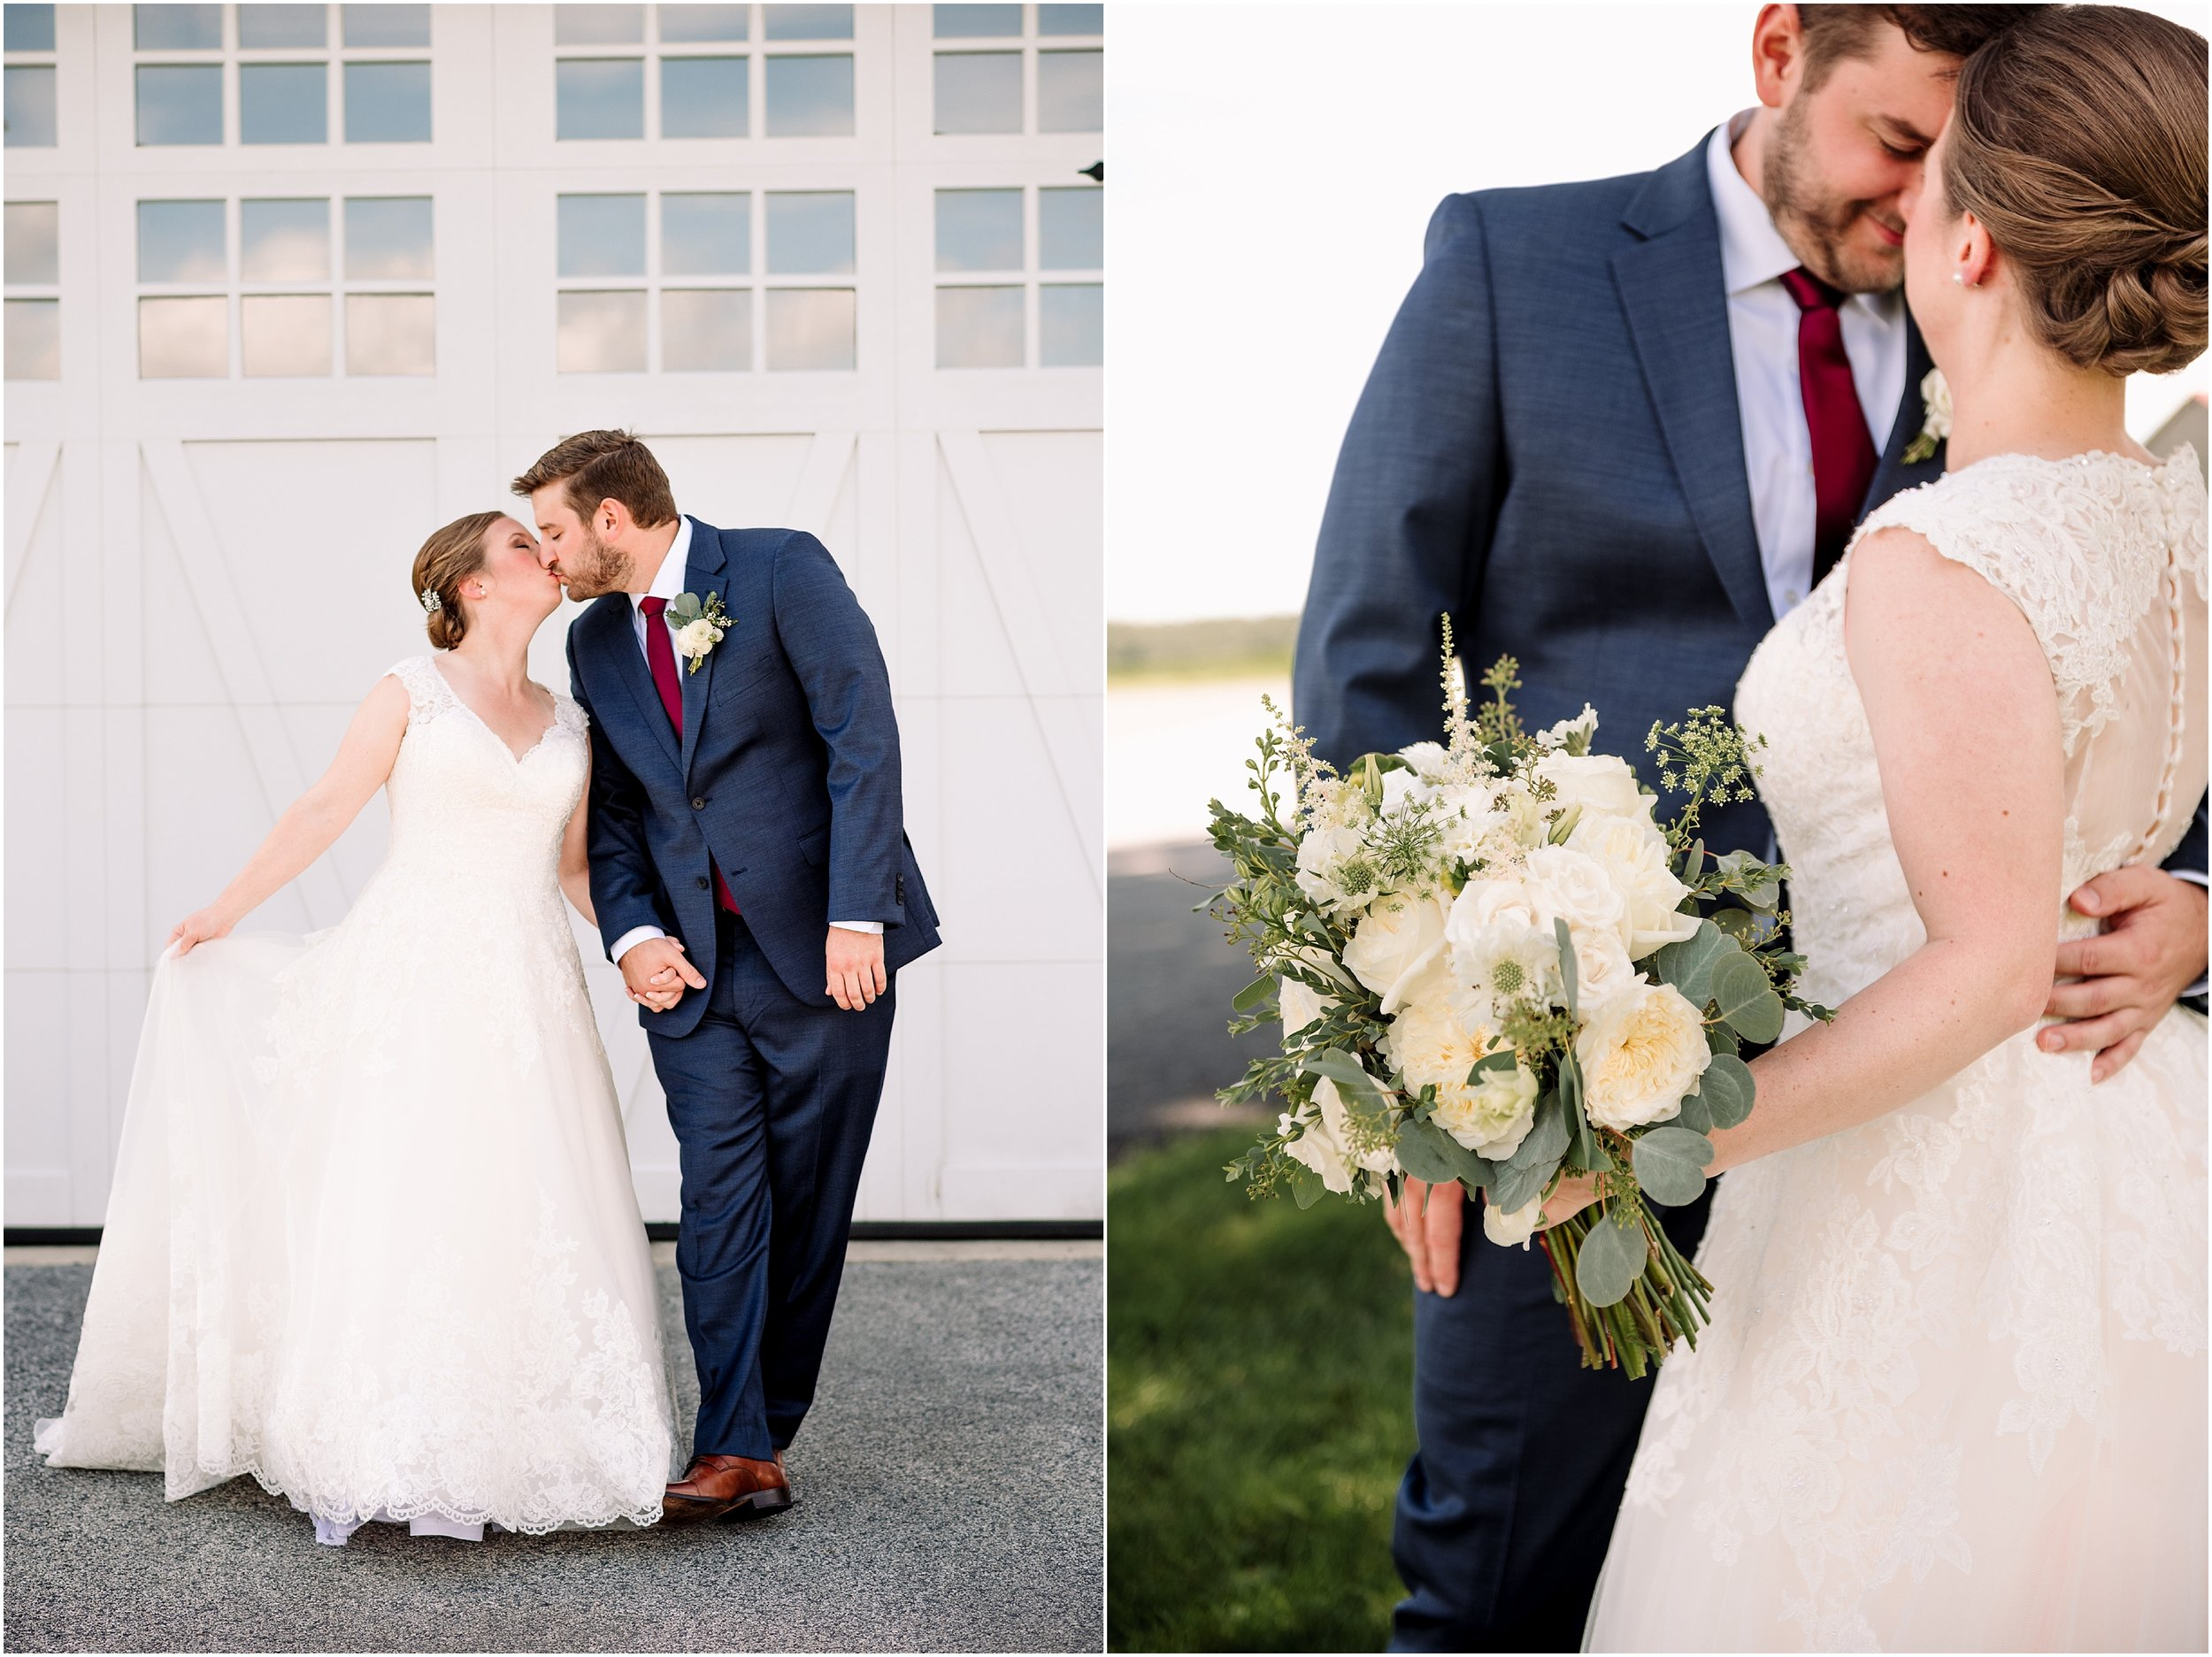 hannah leigh photography Wyndridge Farm Wedding York PA_1487.jpg